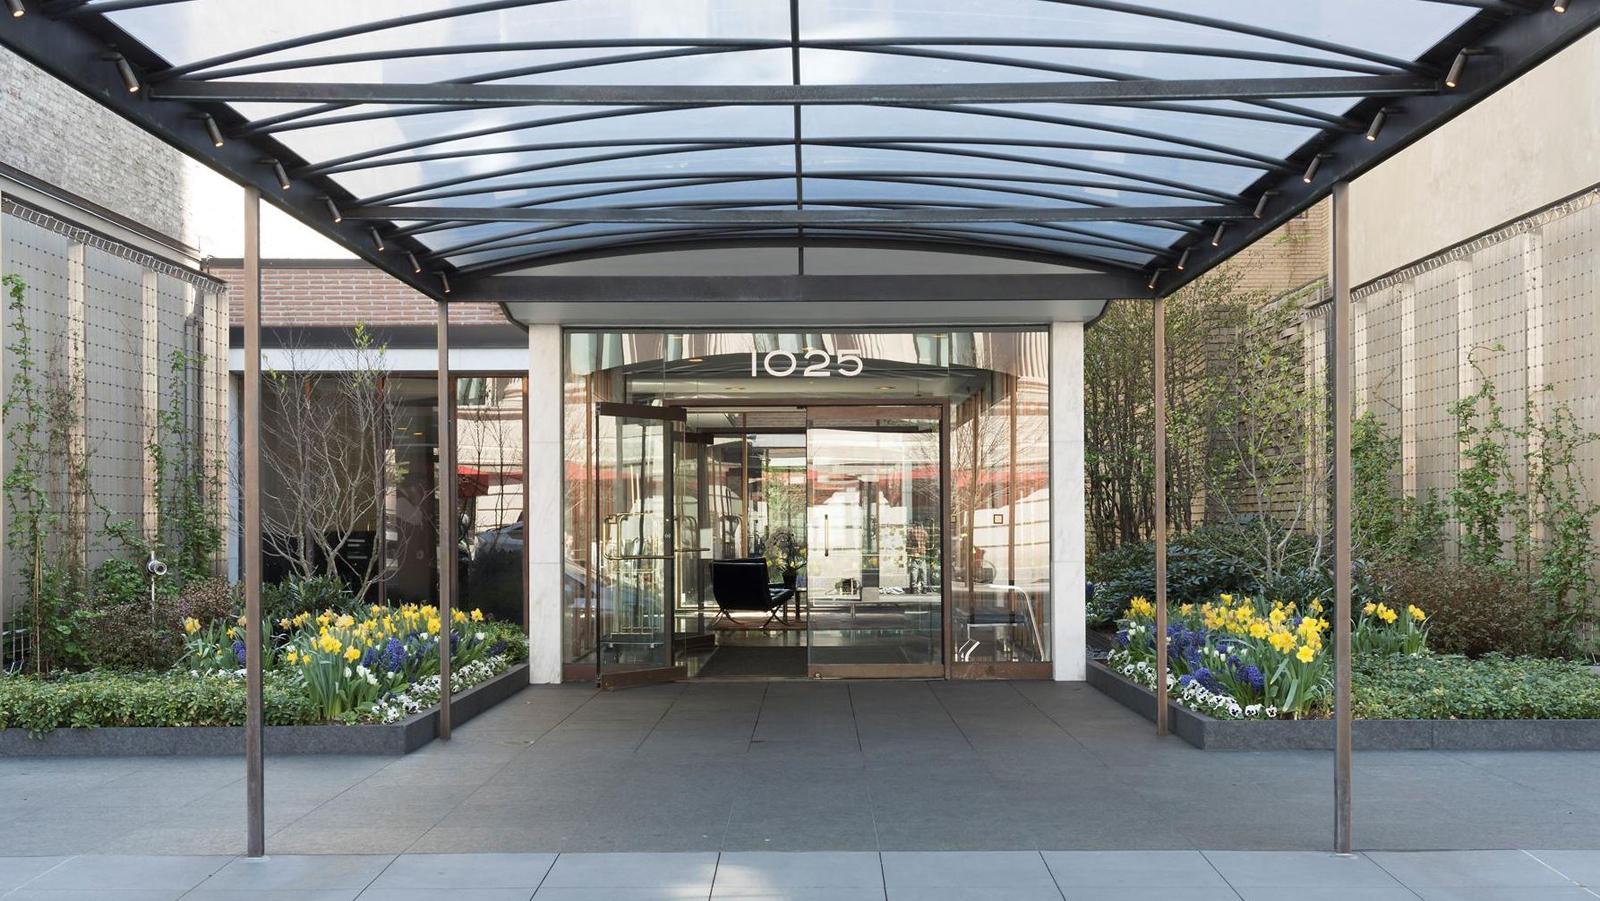 1025 Fifth Avenue